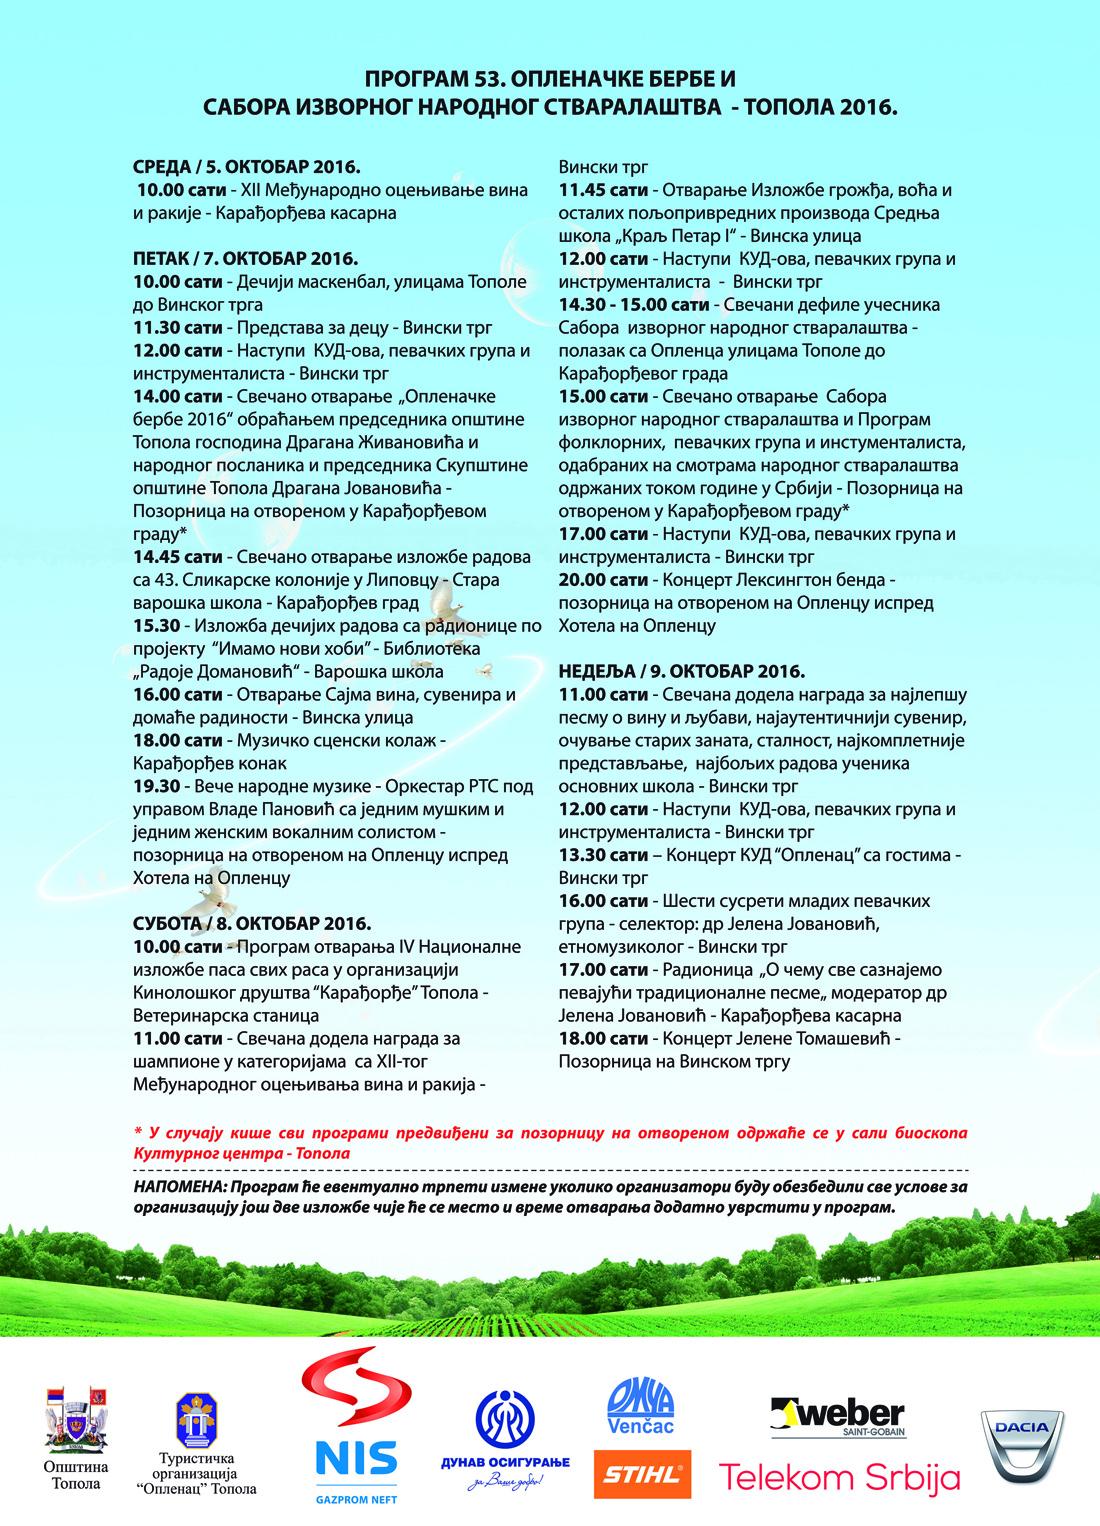 Berba 2016 program